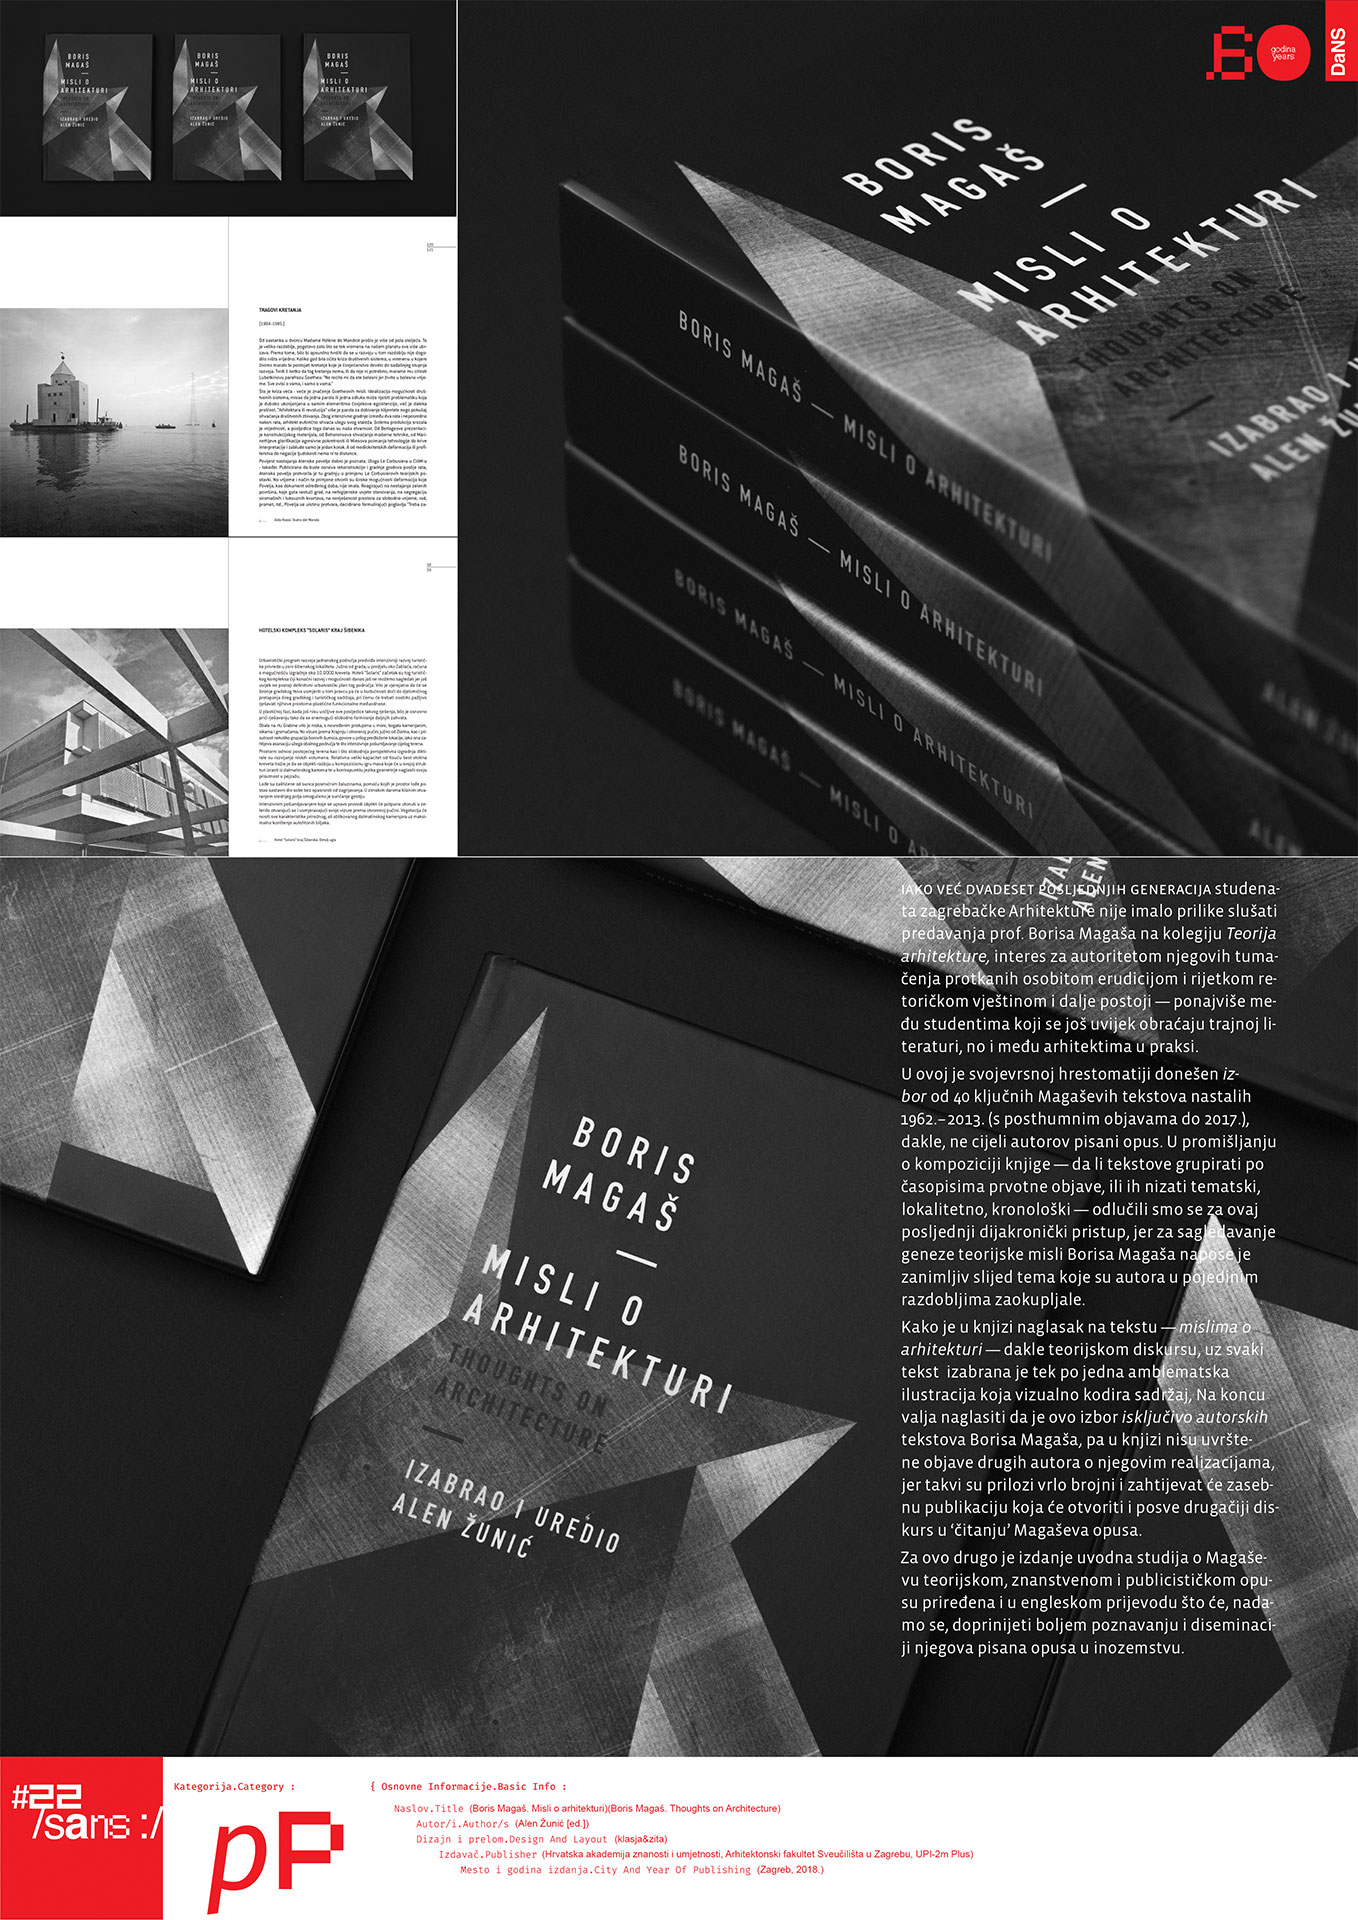 Boris Magaš. Misli o arhitekturi // Thoughts on Architecture